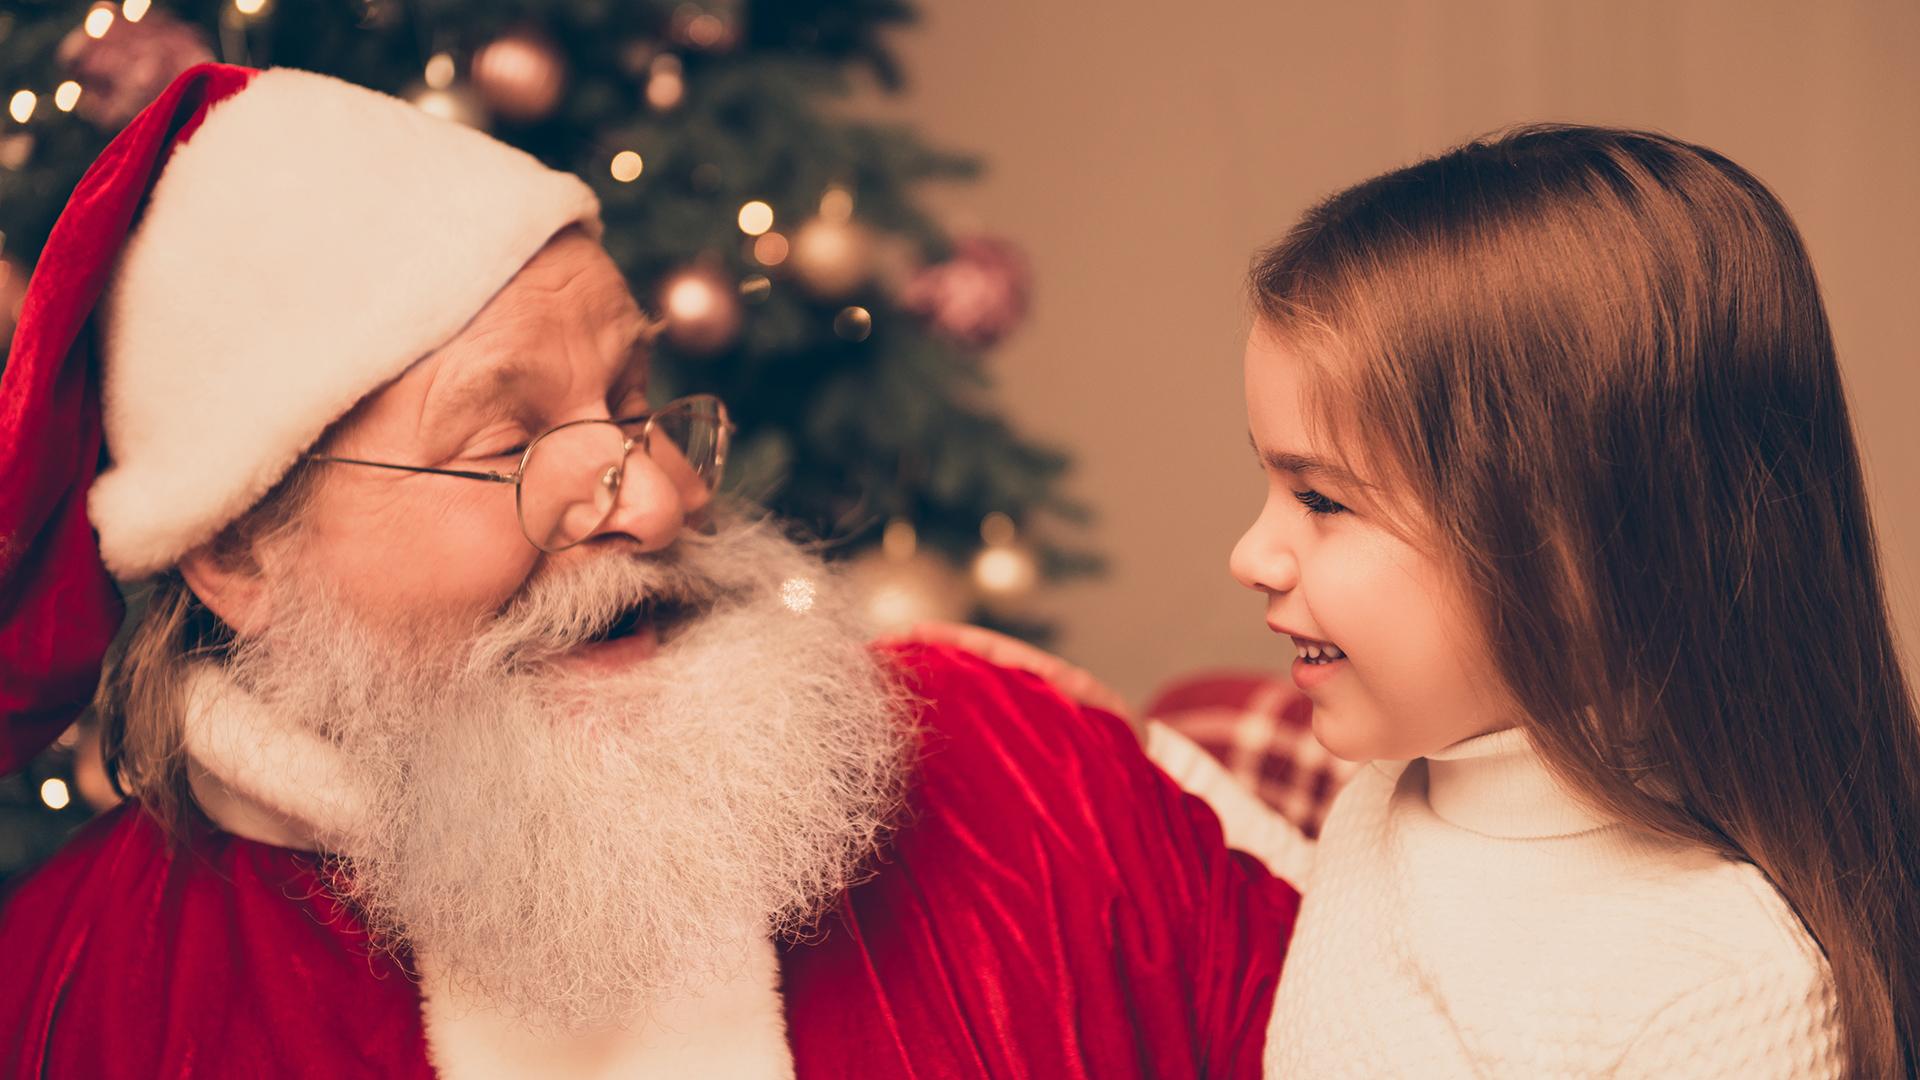 santa girl lap christmas today 161208 tease 70c59d5779a5e6136347ccaceeac6970